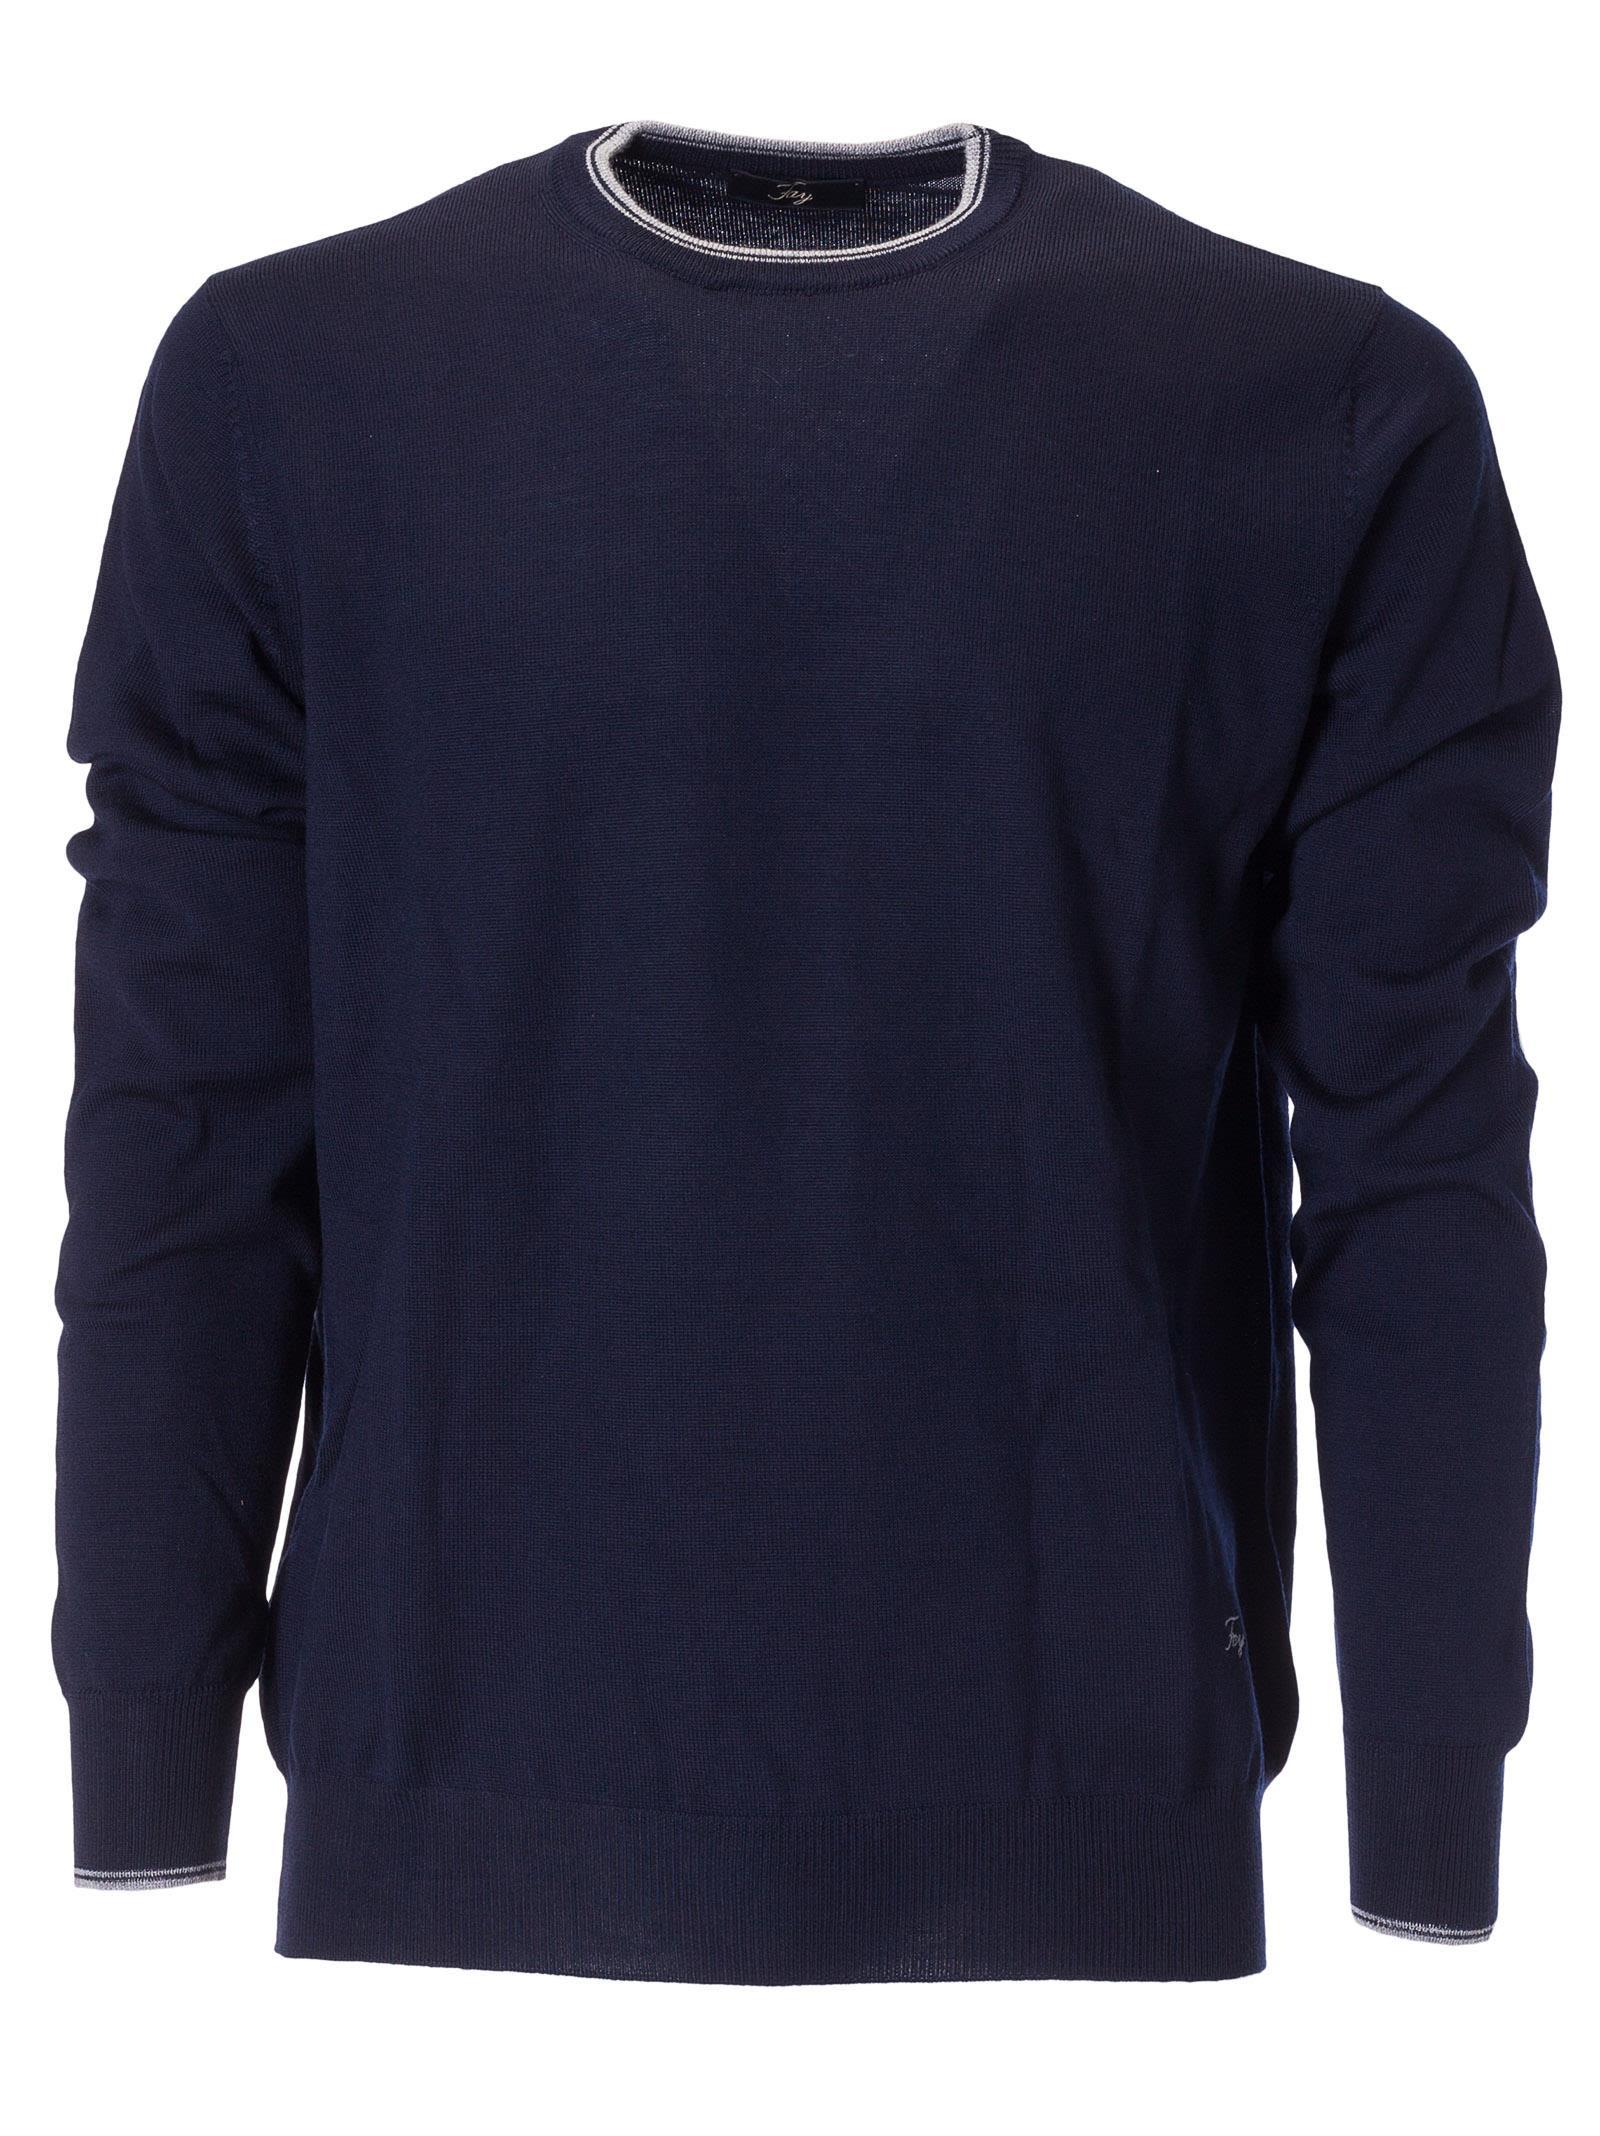 Fay Crew Neck Sweater